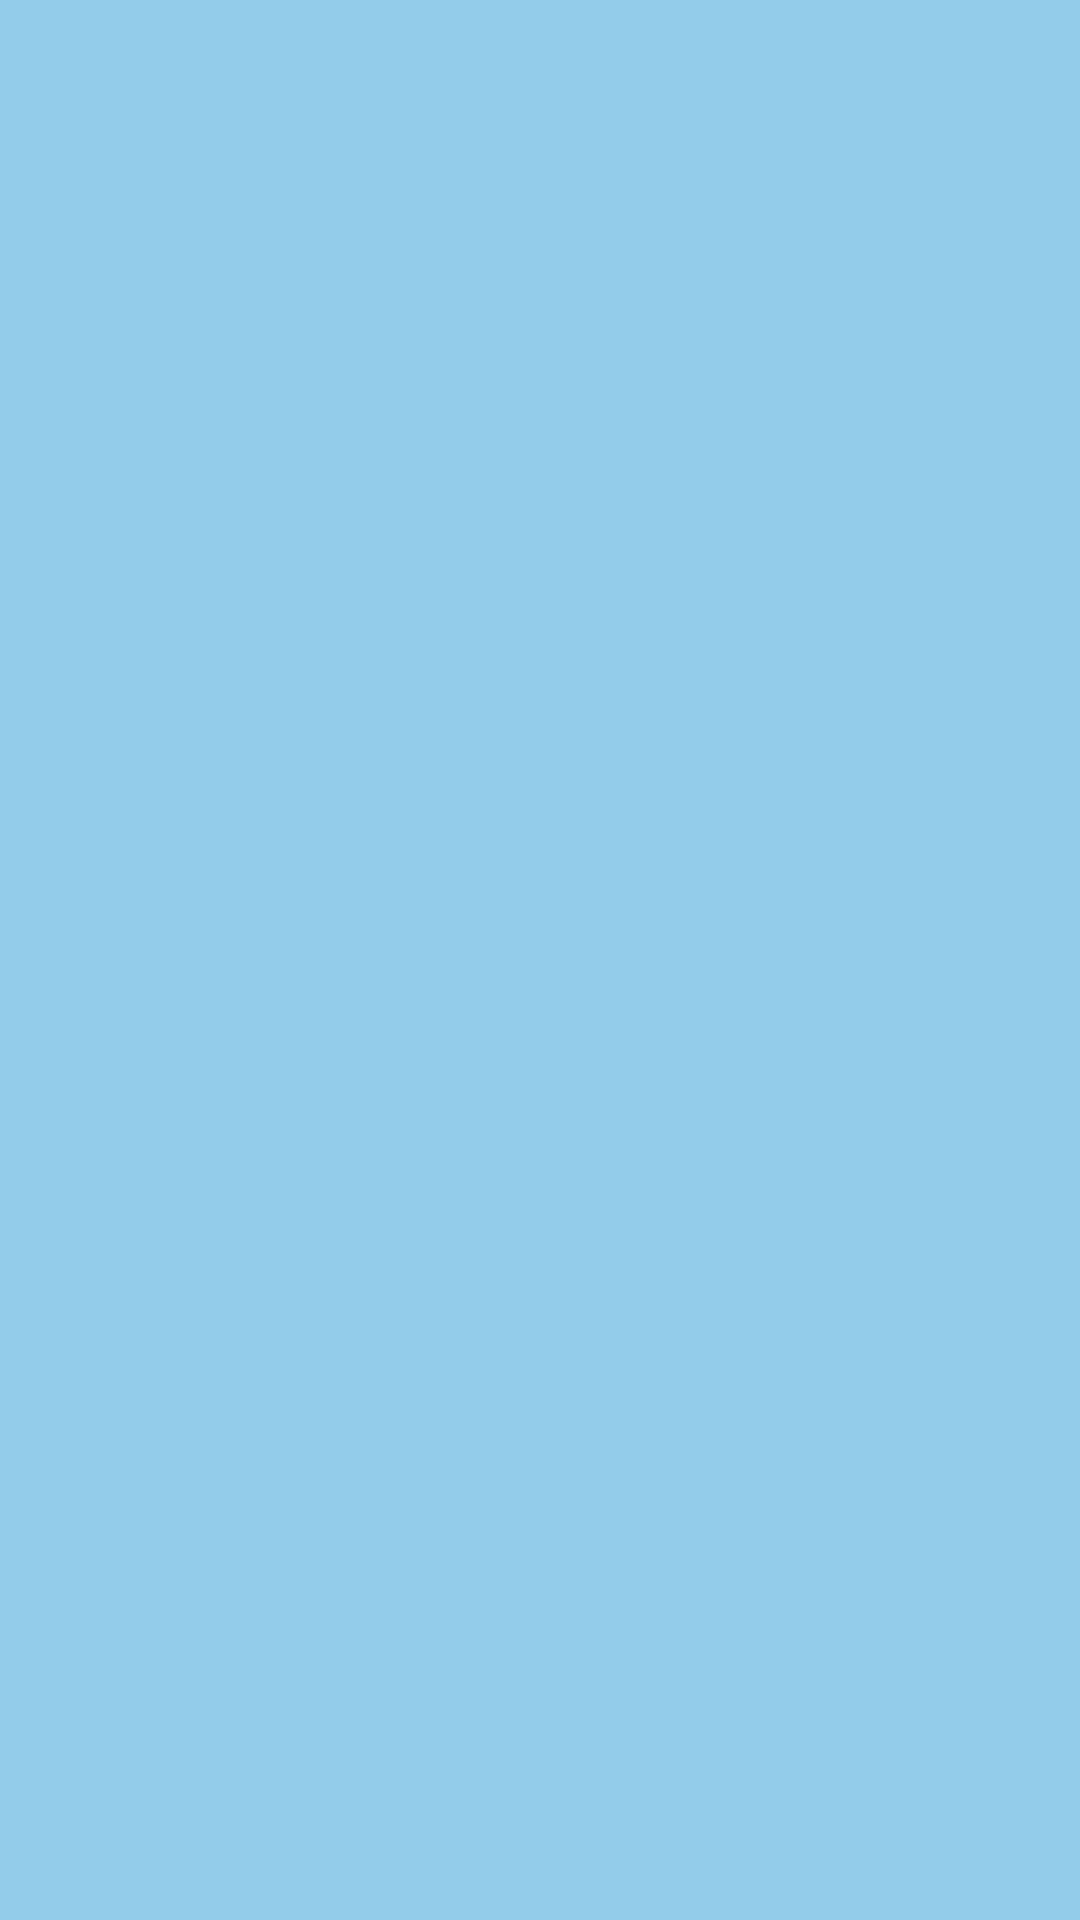 1080x1920 Light Cornflower Blue Solid Color Background